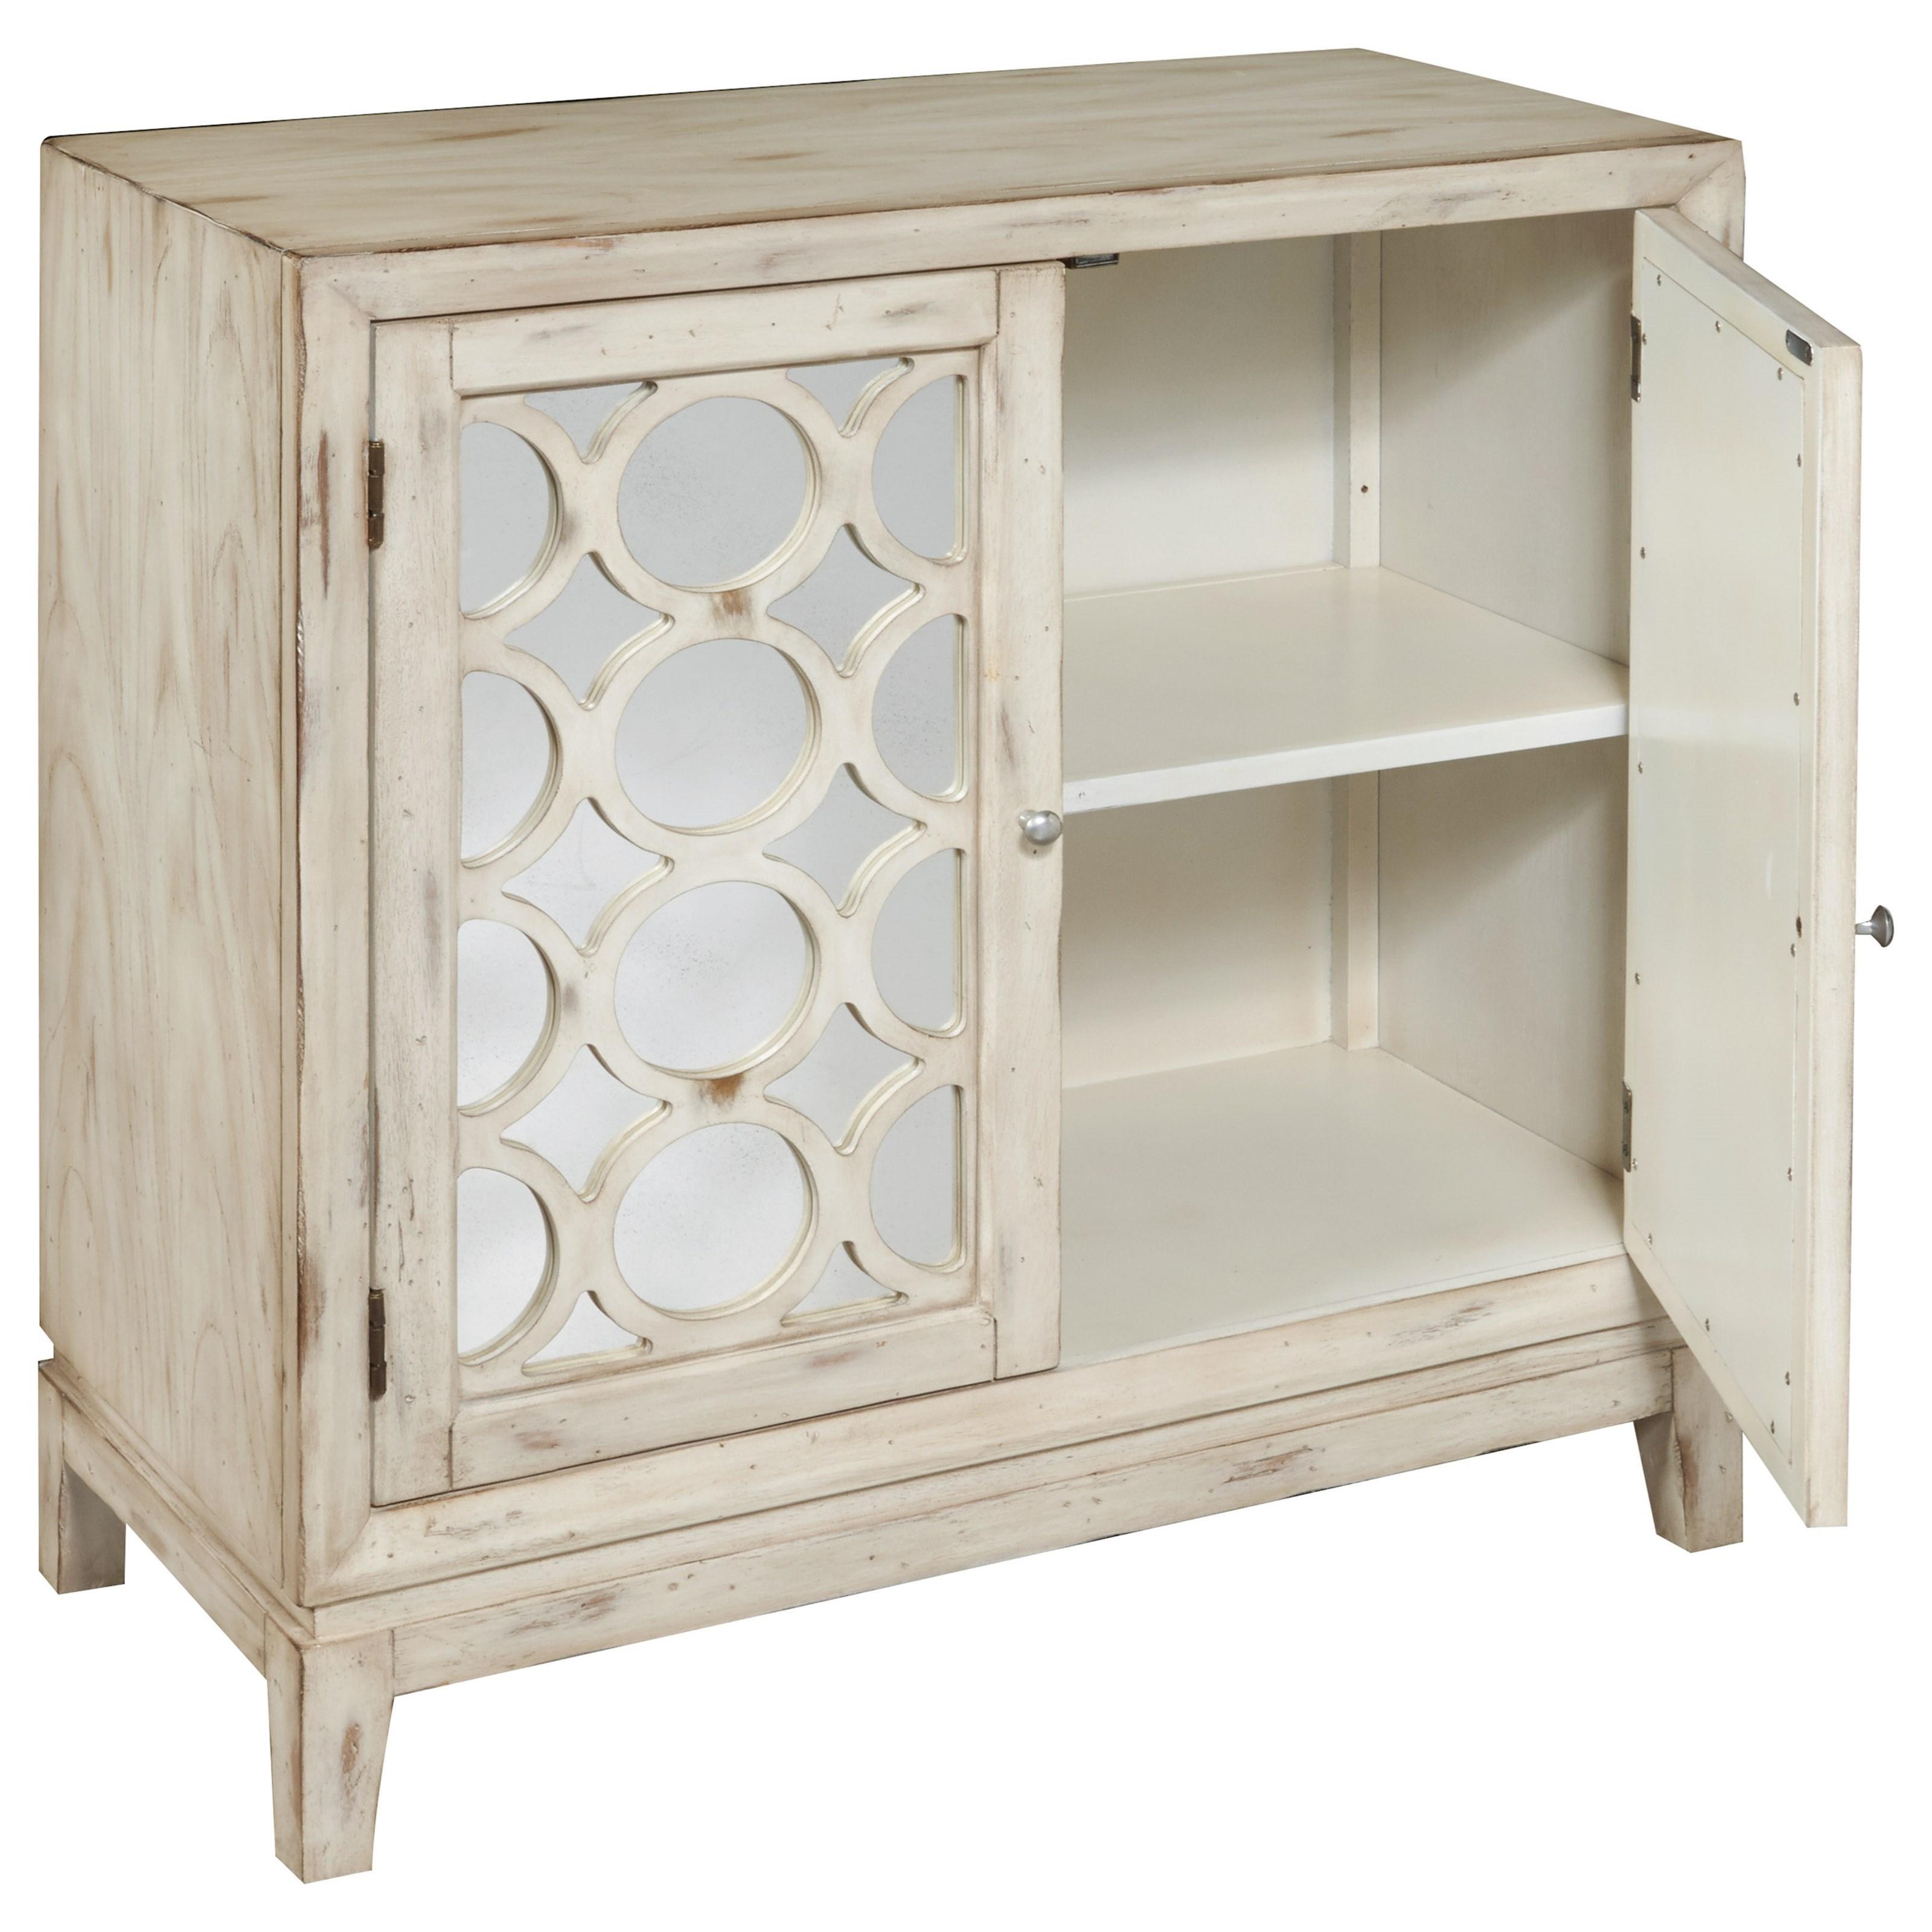 Pulaski Furniture Accents Quinn Hall Chest With 1 Adjustable Shelf Belfort Furniture Accent